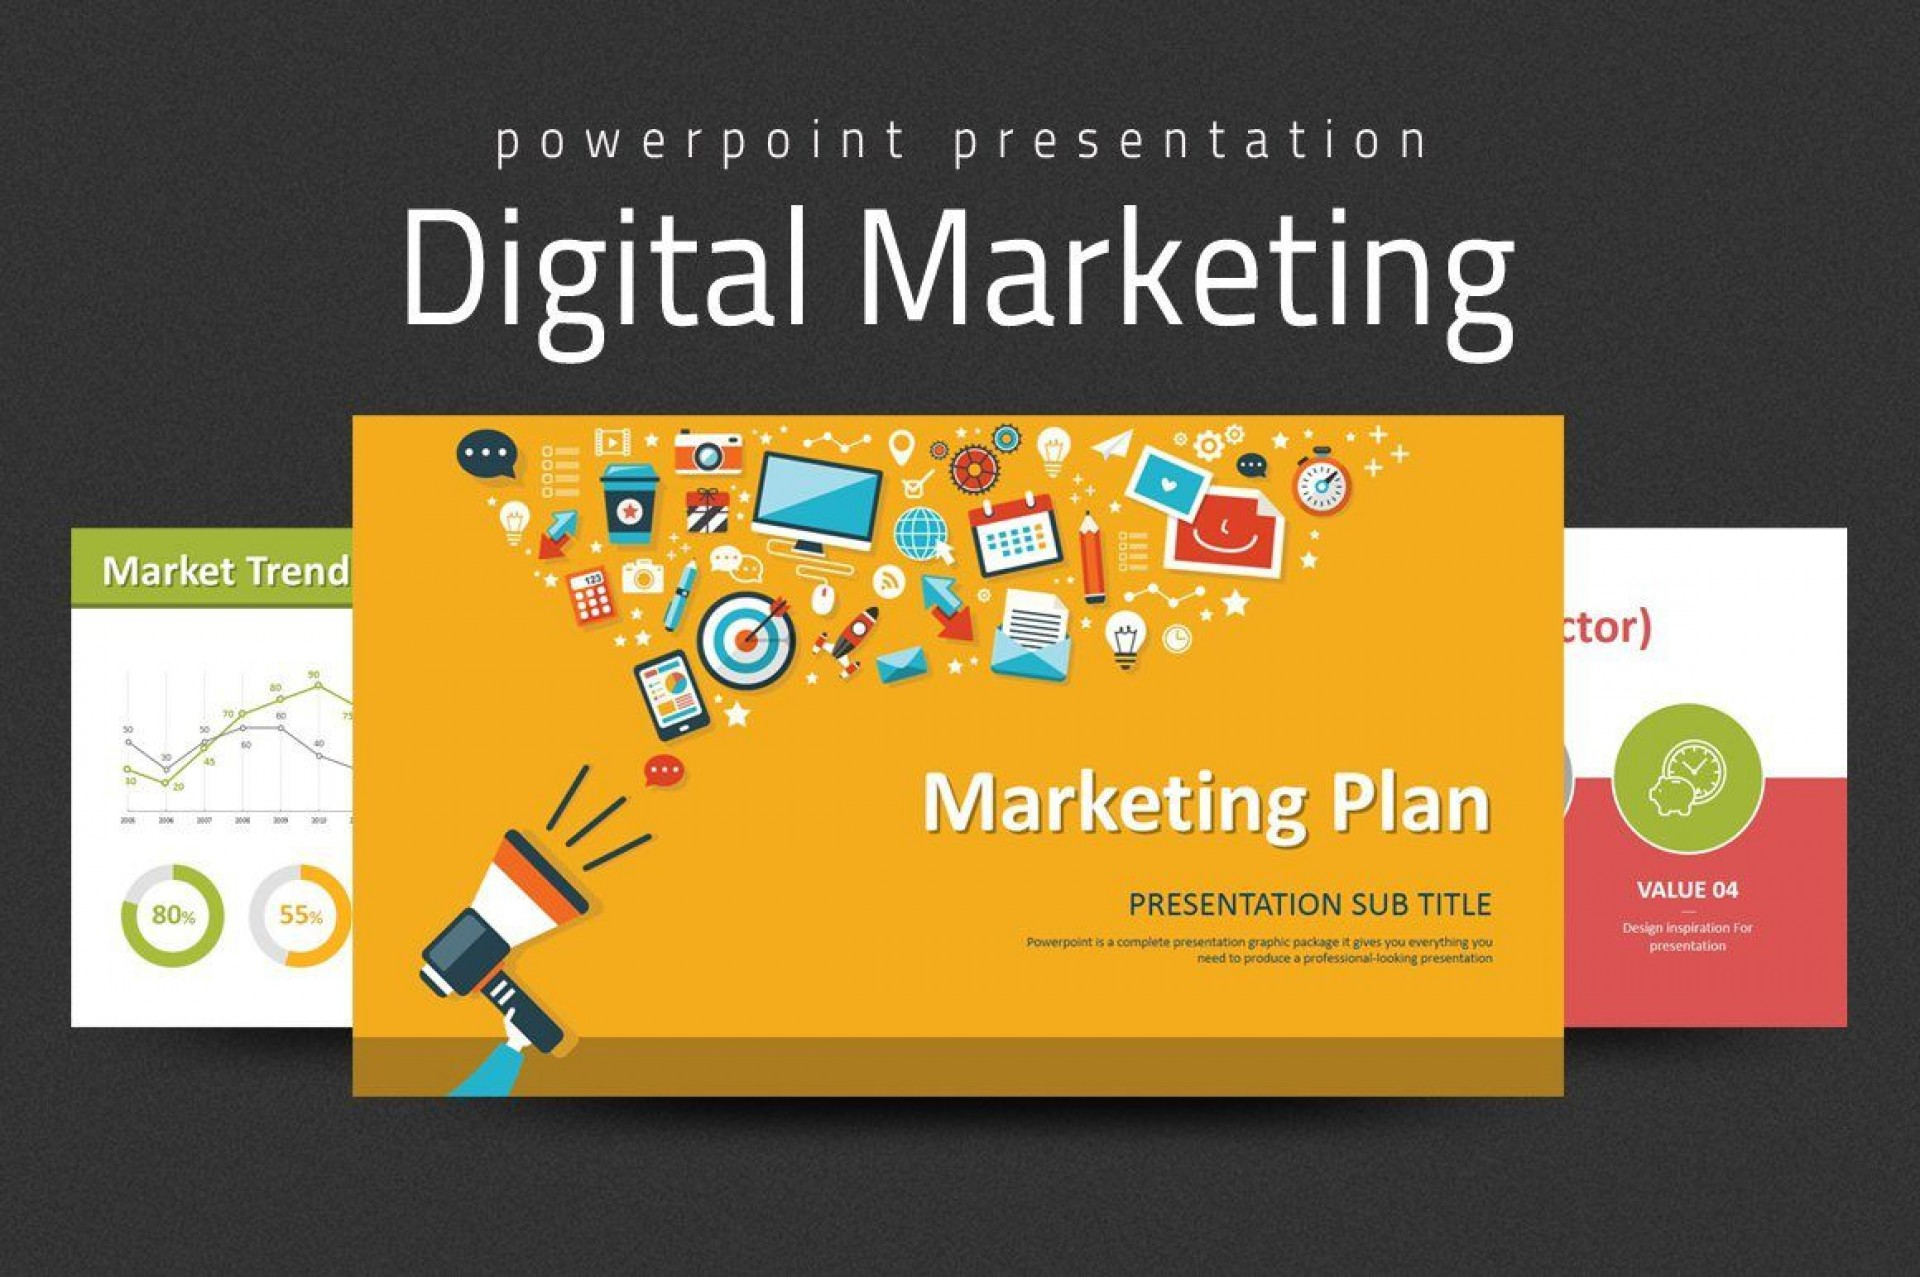 000 Incredible Digital Marketing Plan Template Ppt High Resolution  Presentation Free Slideshare1920